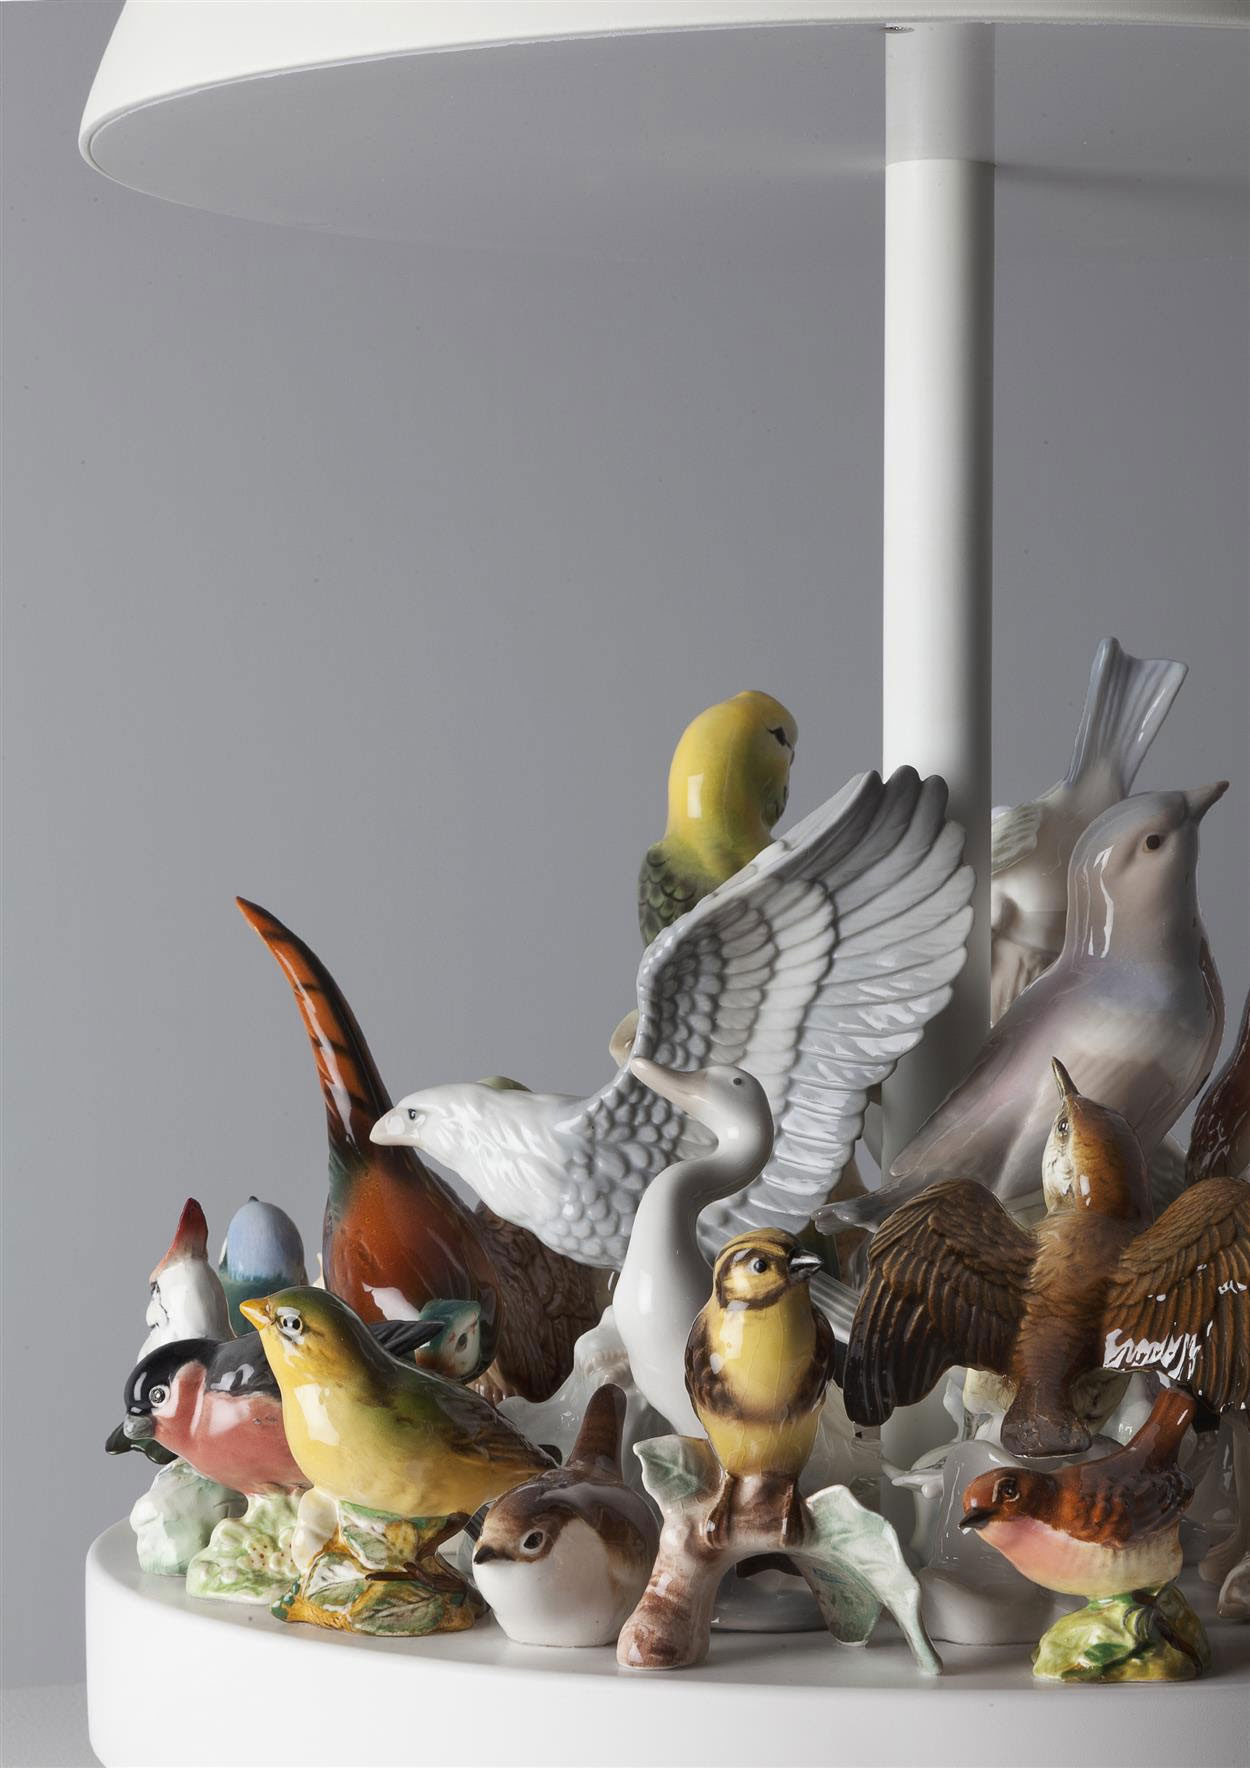 Stuart Haygarth, Island, 2016. Corian, Spun Metal Shade and Ceramic Birds Figurines. Photo courtesy Carpenters Workshop Gallery.